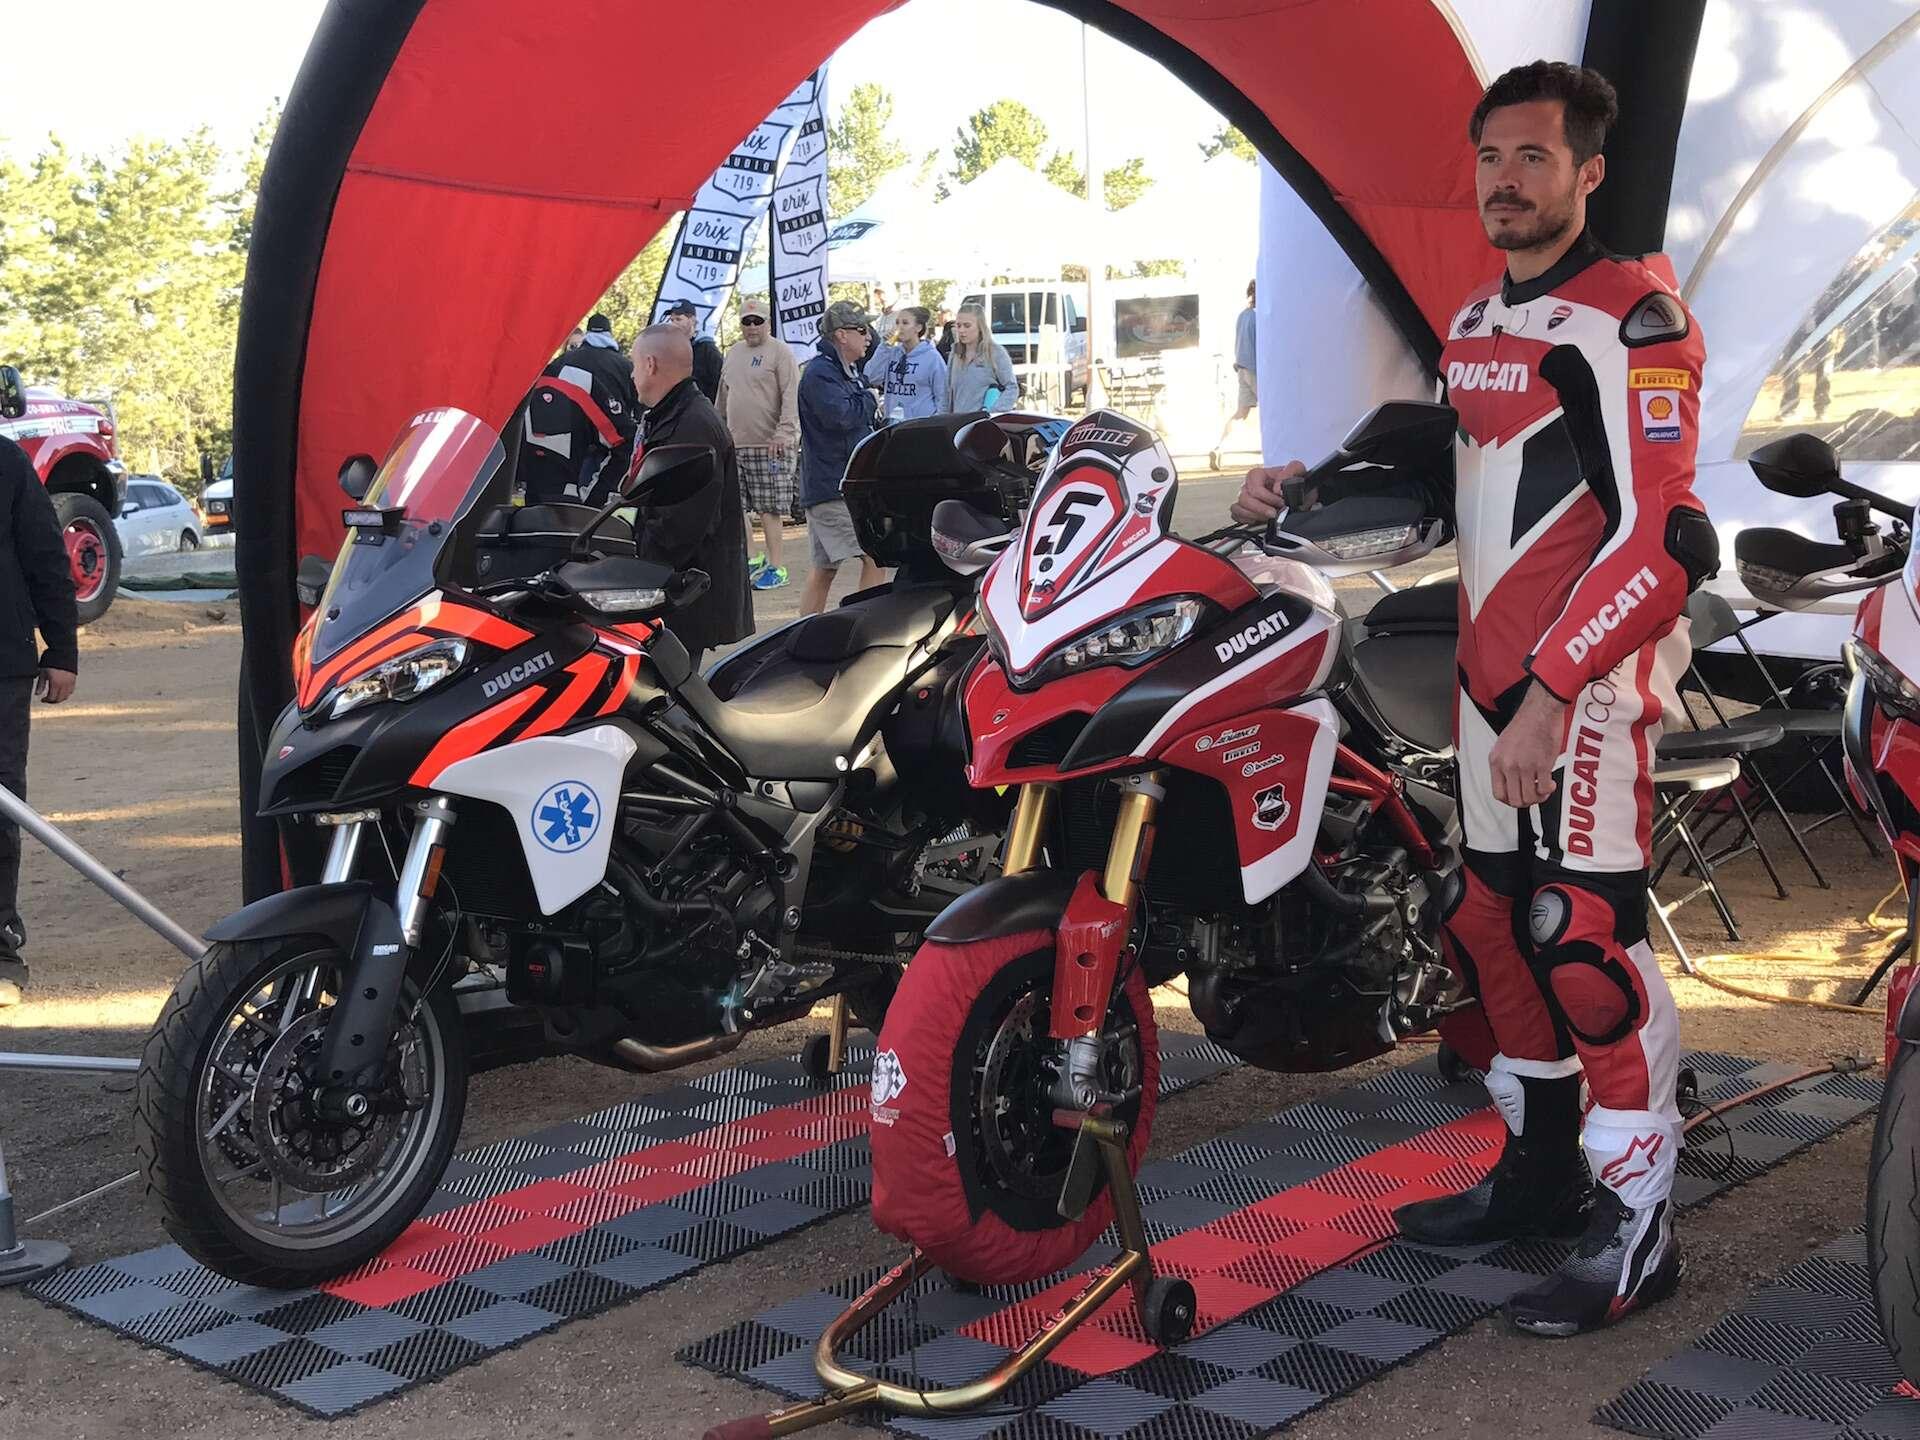 How Ducati Helped Keep Motorcycle Racing Alive At The Pikes Peak